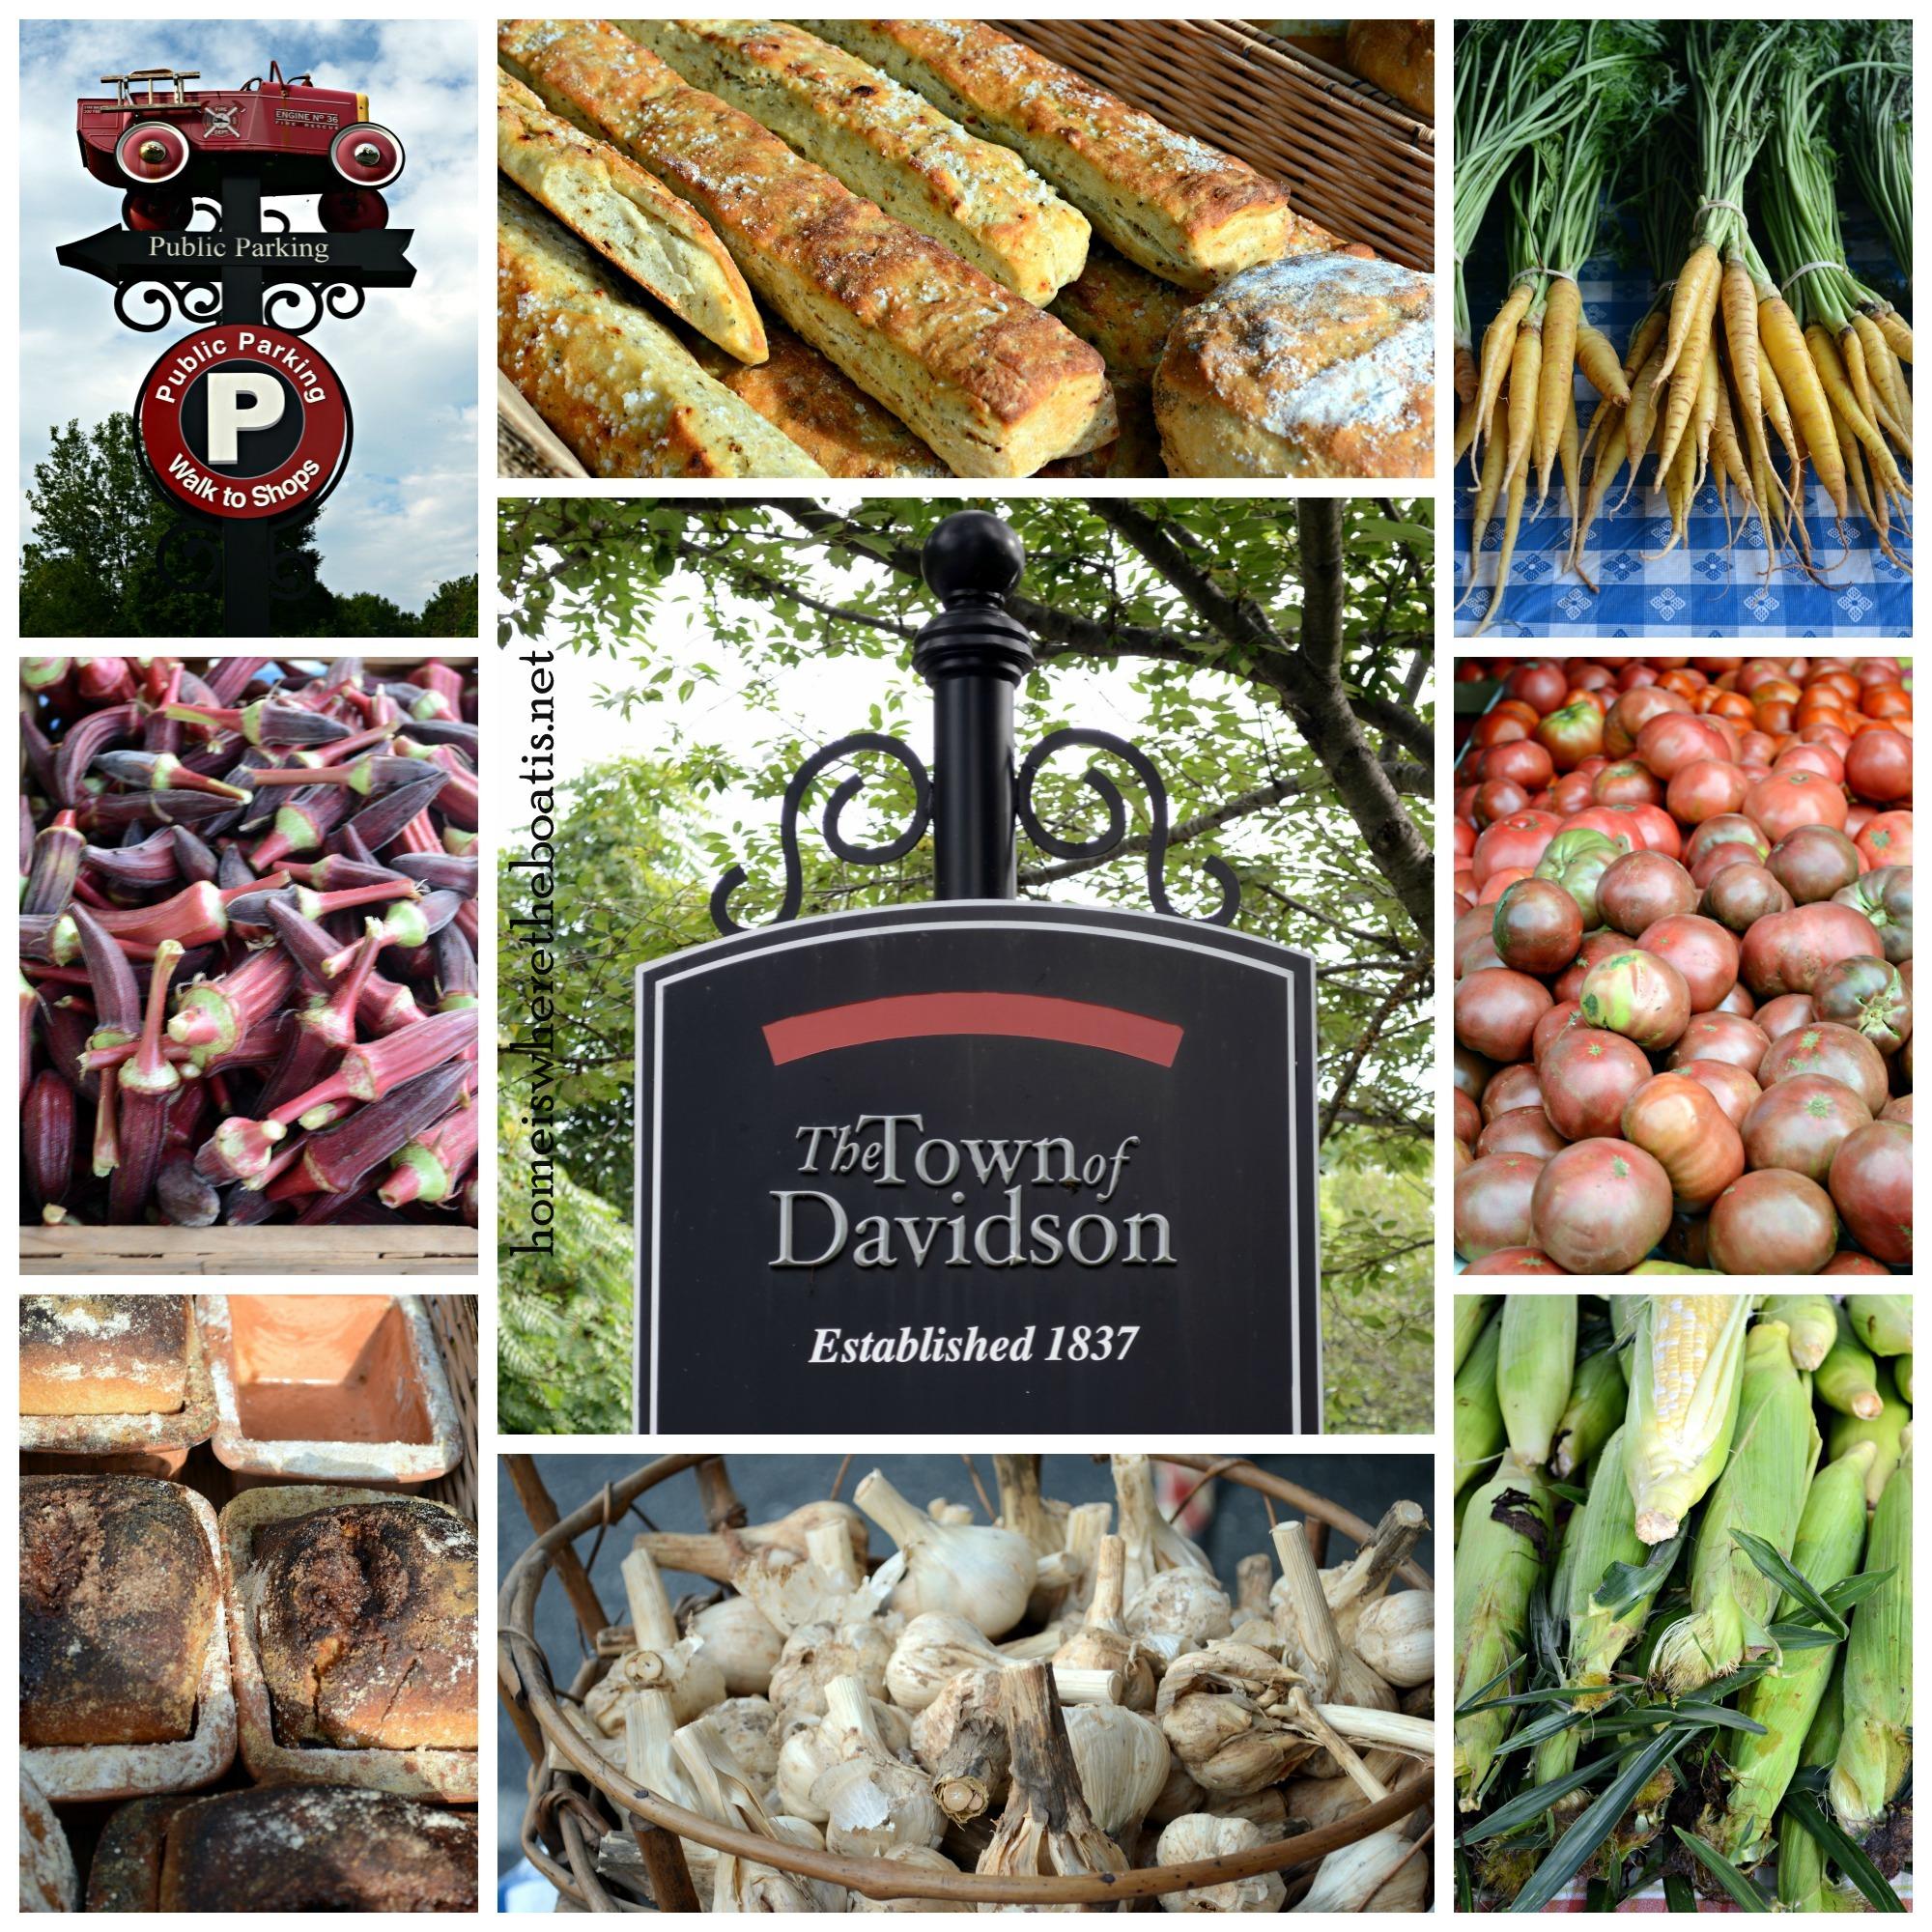 IMage Courtesy: Davidson Farmers' Market